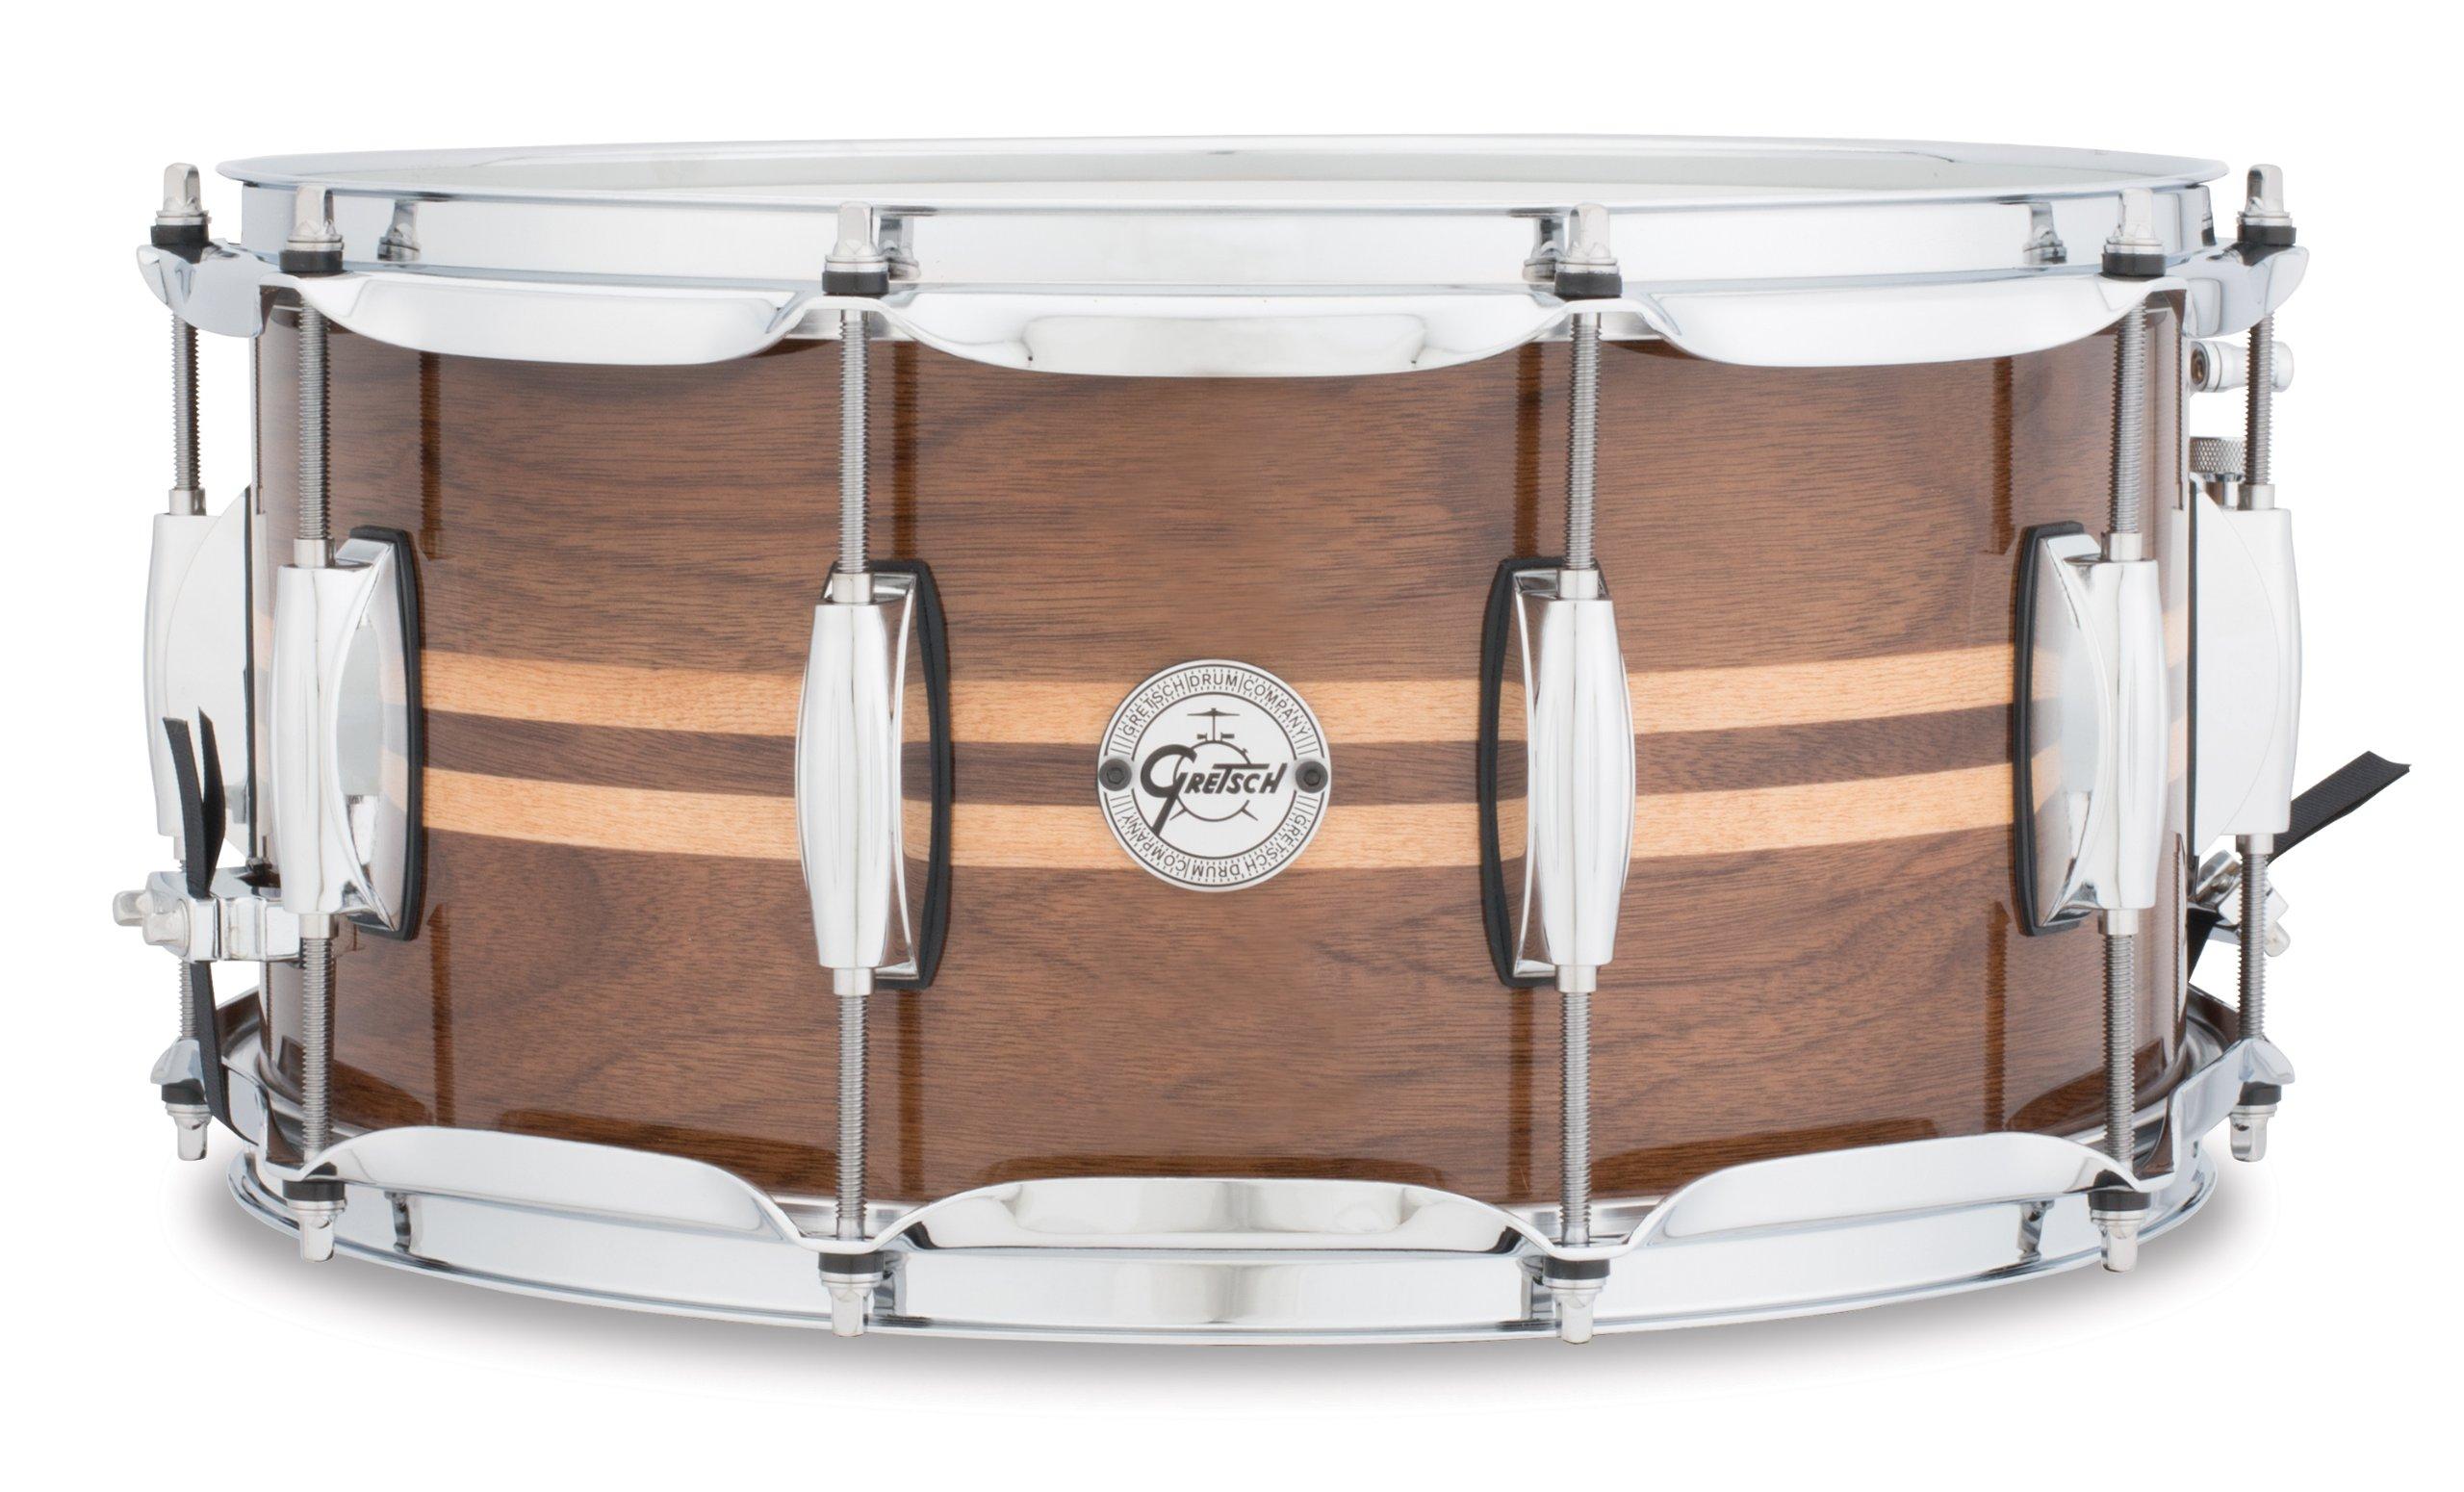 Gretsch Drums Full Range Series S1-6514W-MI 14x6.5'' Gloss Walnut Snare W/Maple Inlay by Gretsch